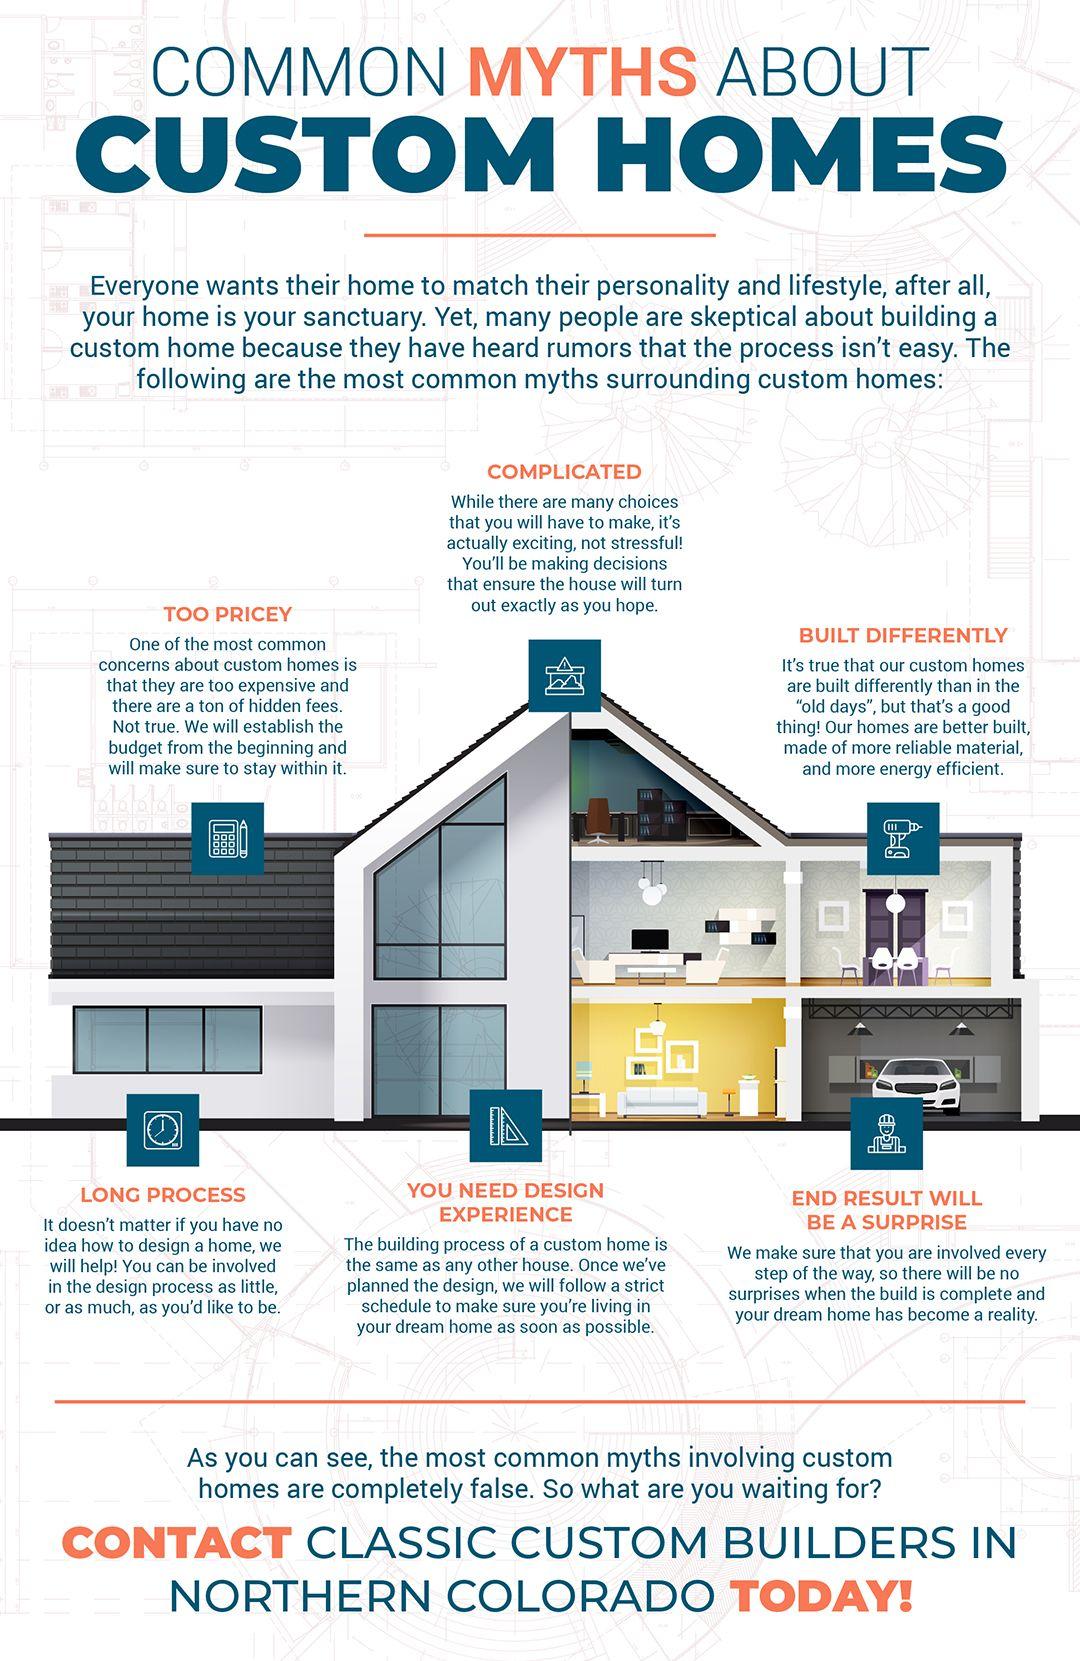 ClassicCustomBuilders-Infographic-01-5c8a44d0627d2.jpg